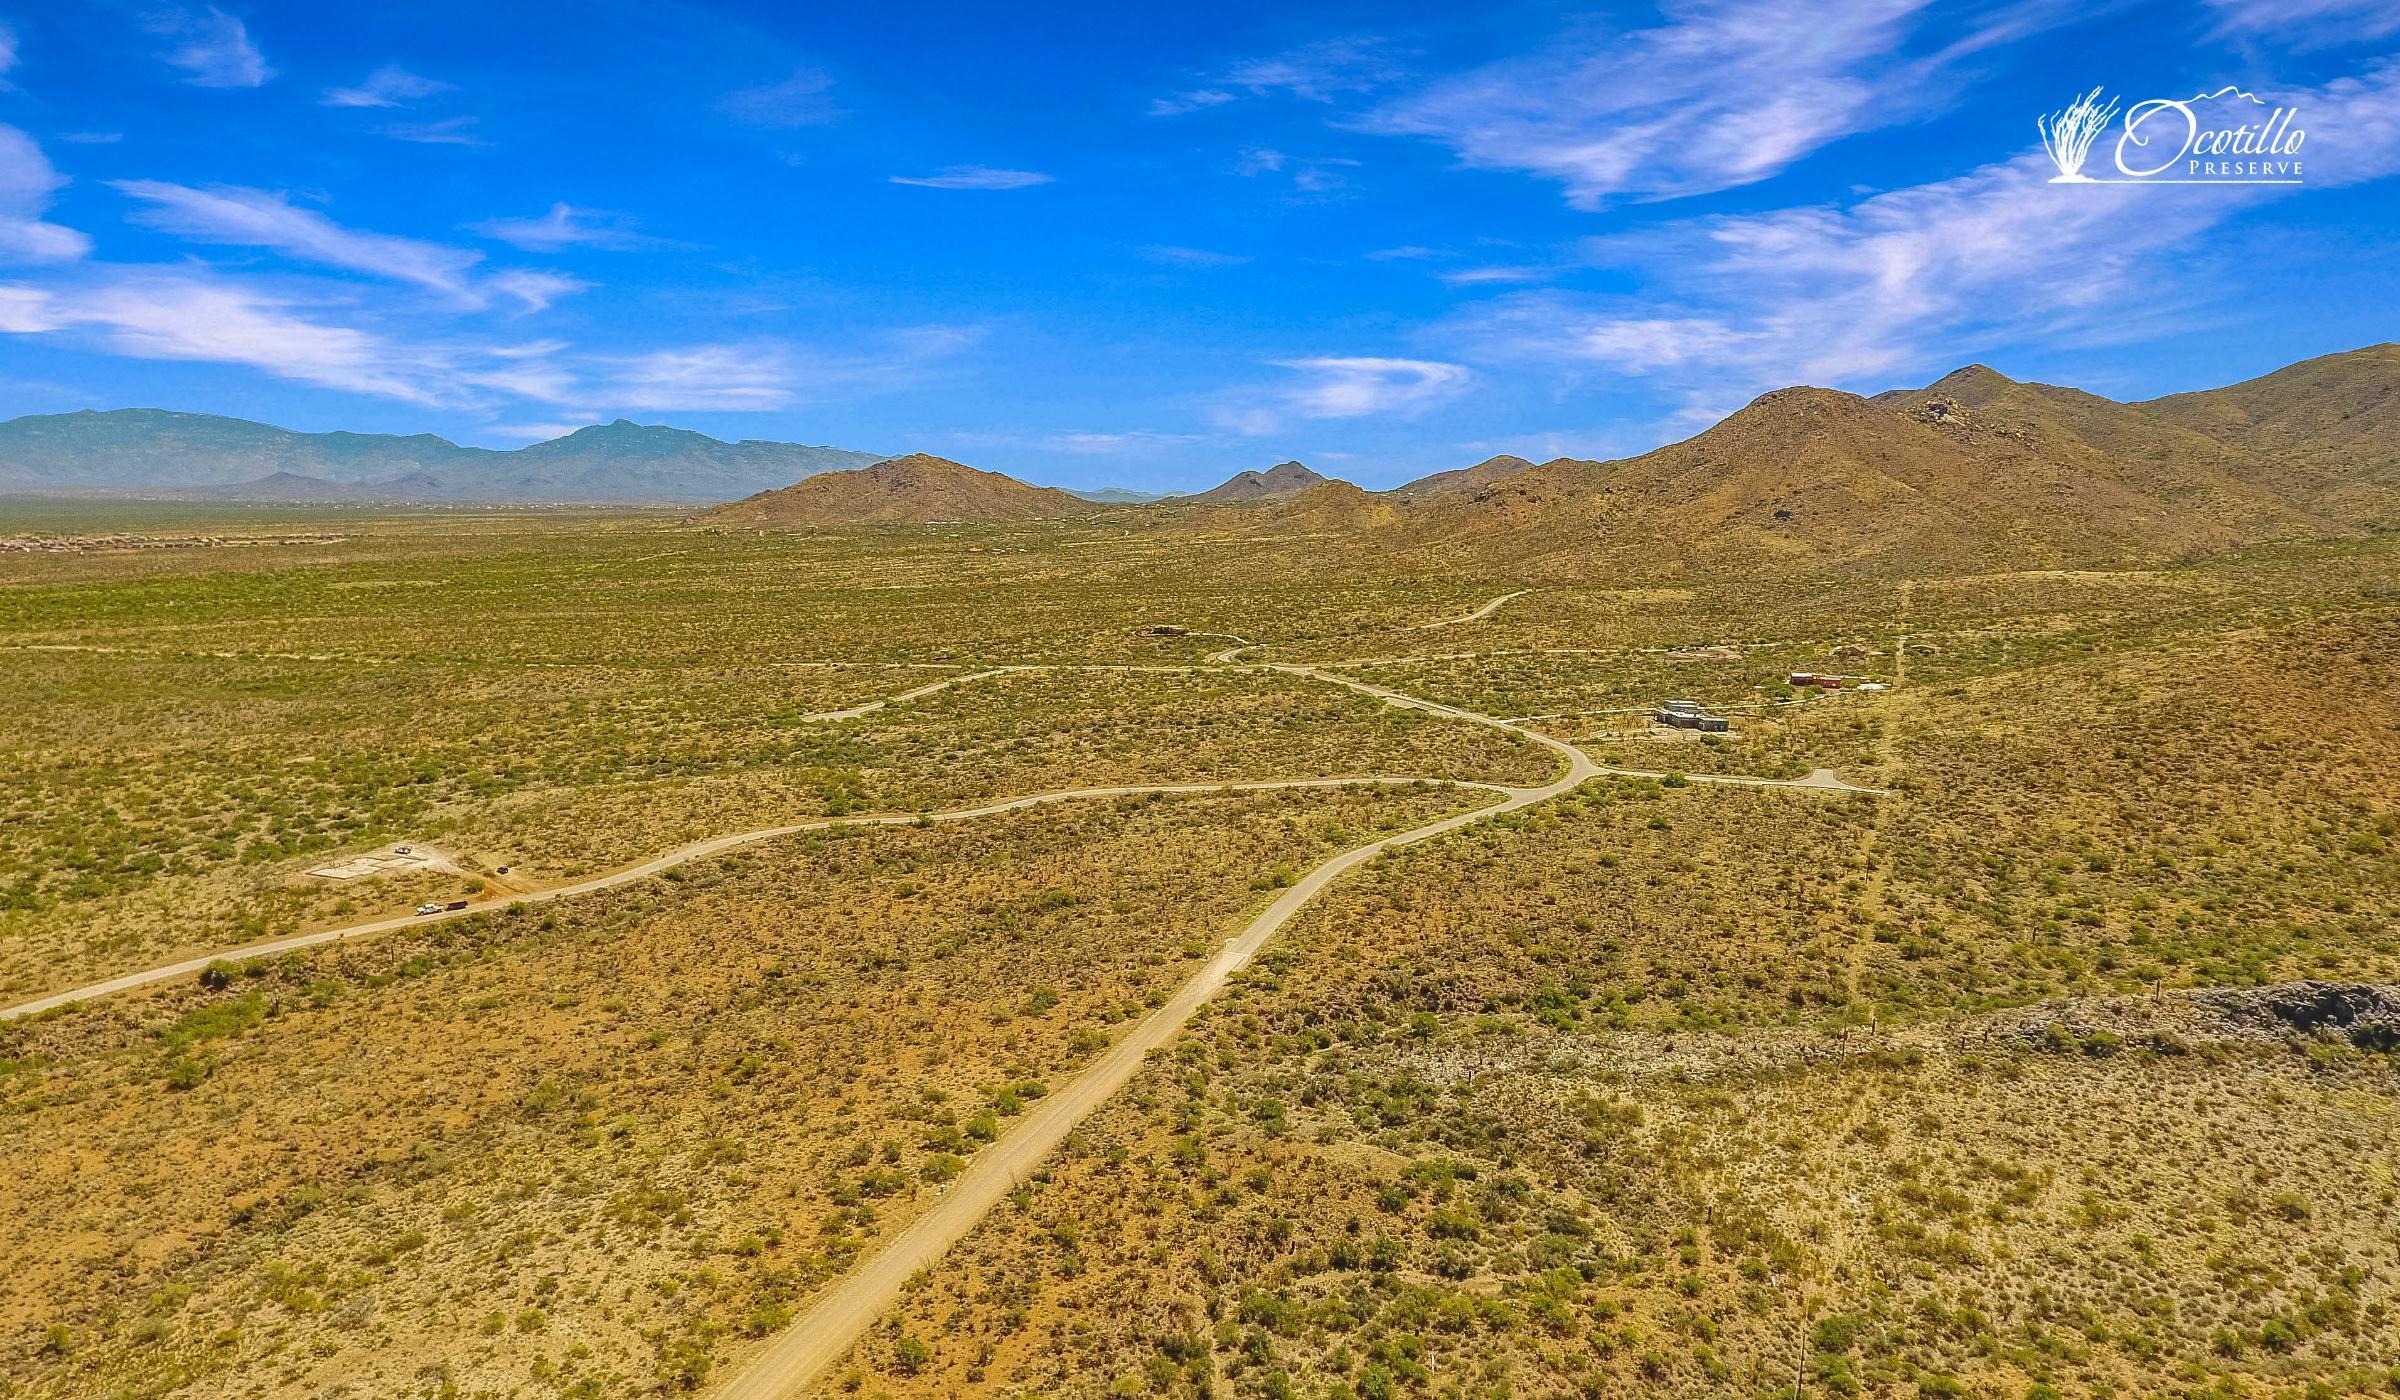 'Ocotillo' by Ocotillo in Tucson